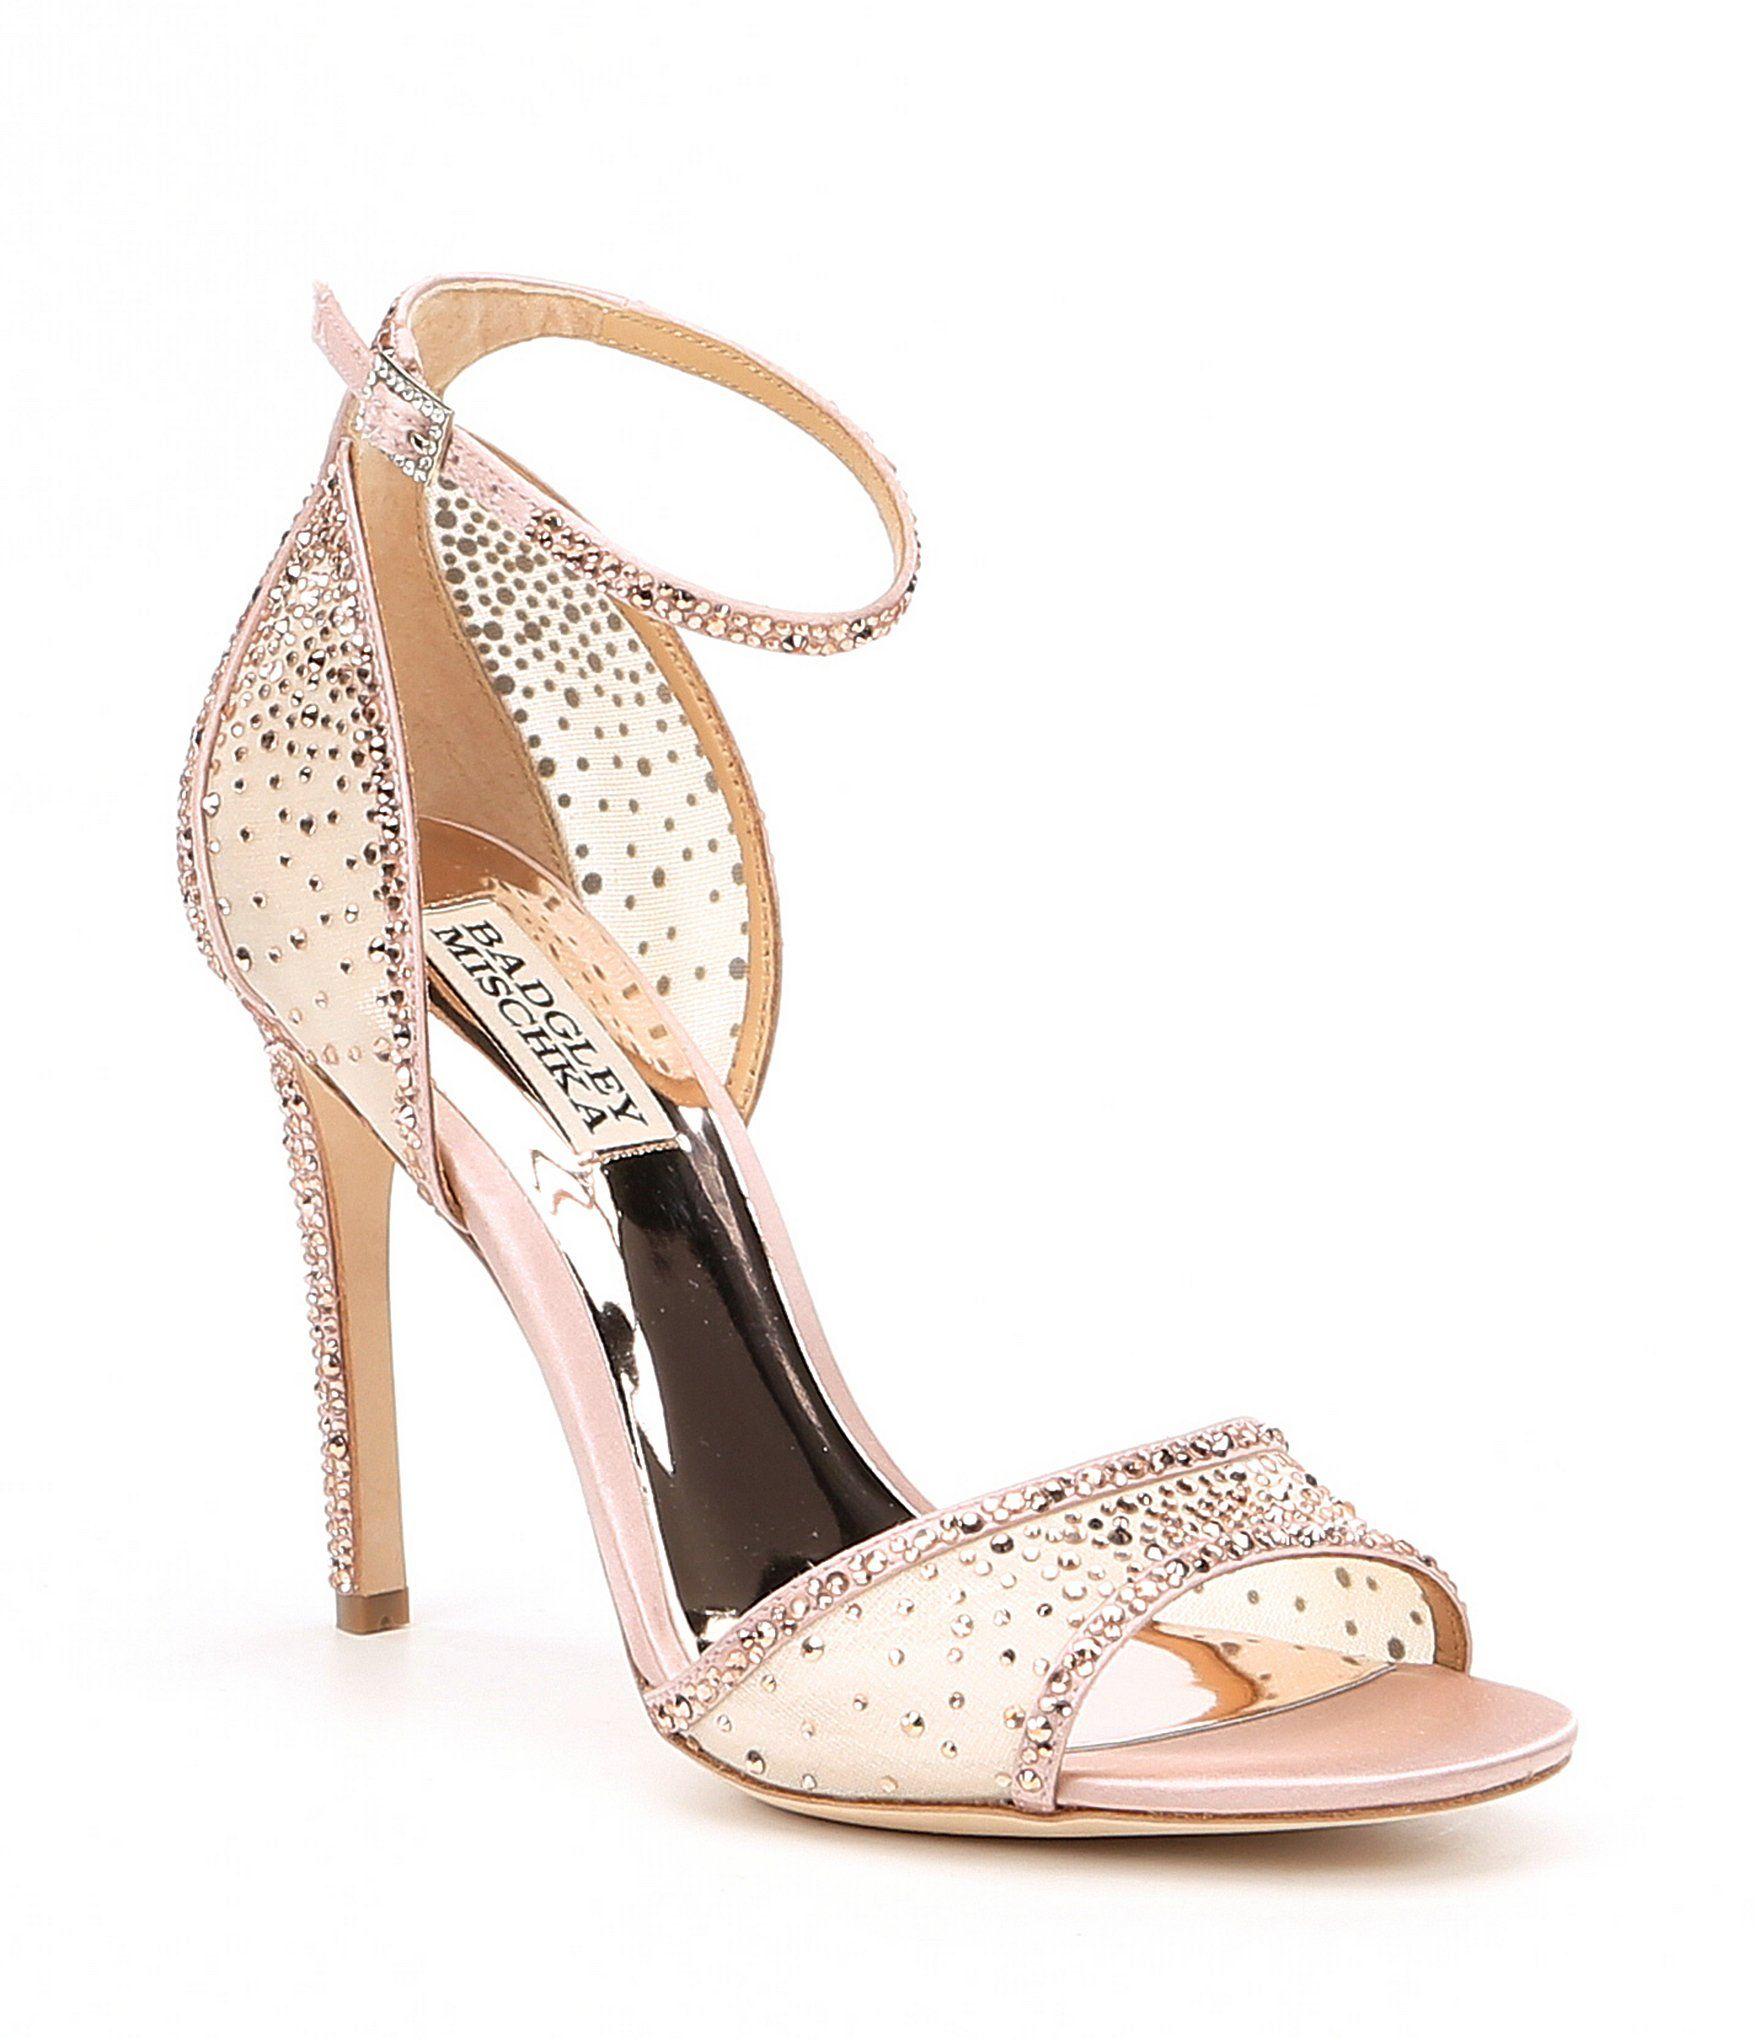 d630158e291 Badgley Mischka Shiraz Mesh and Satin Rhinestone Detail Ankle Strap PeepToe  Dress Sandals  Dillards